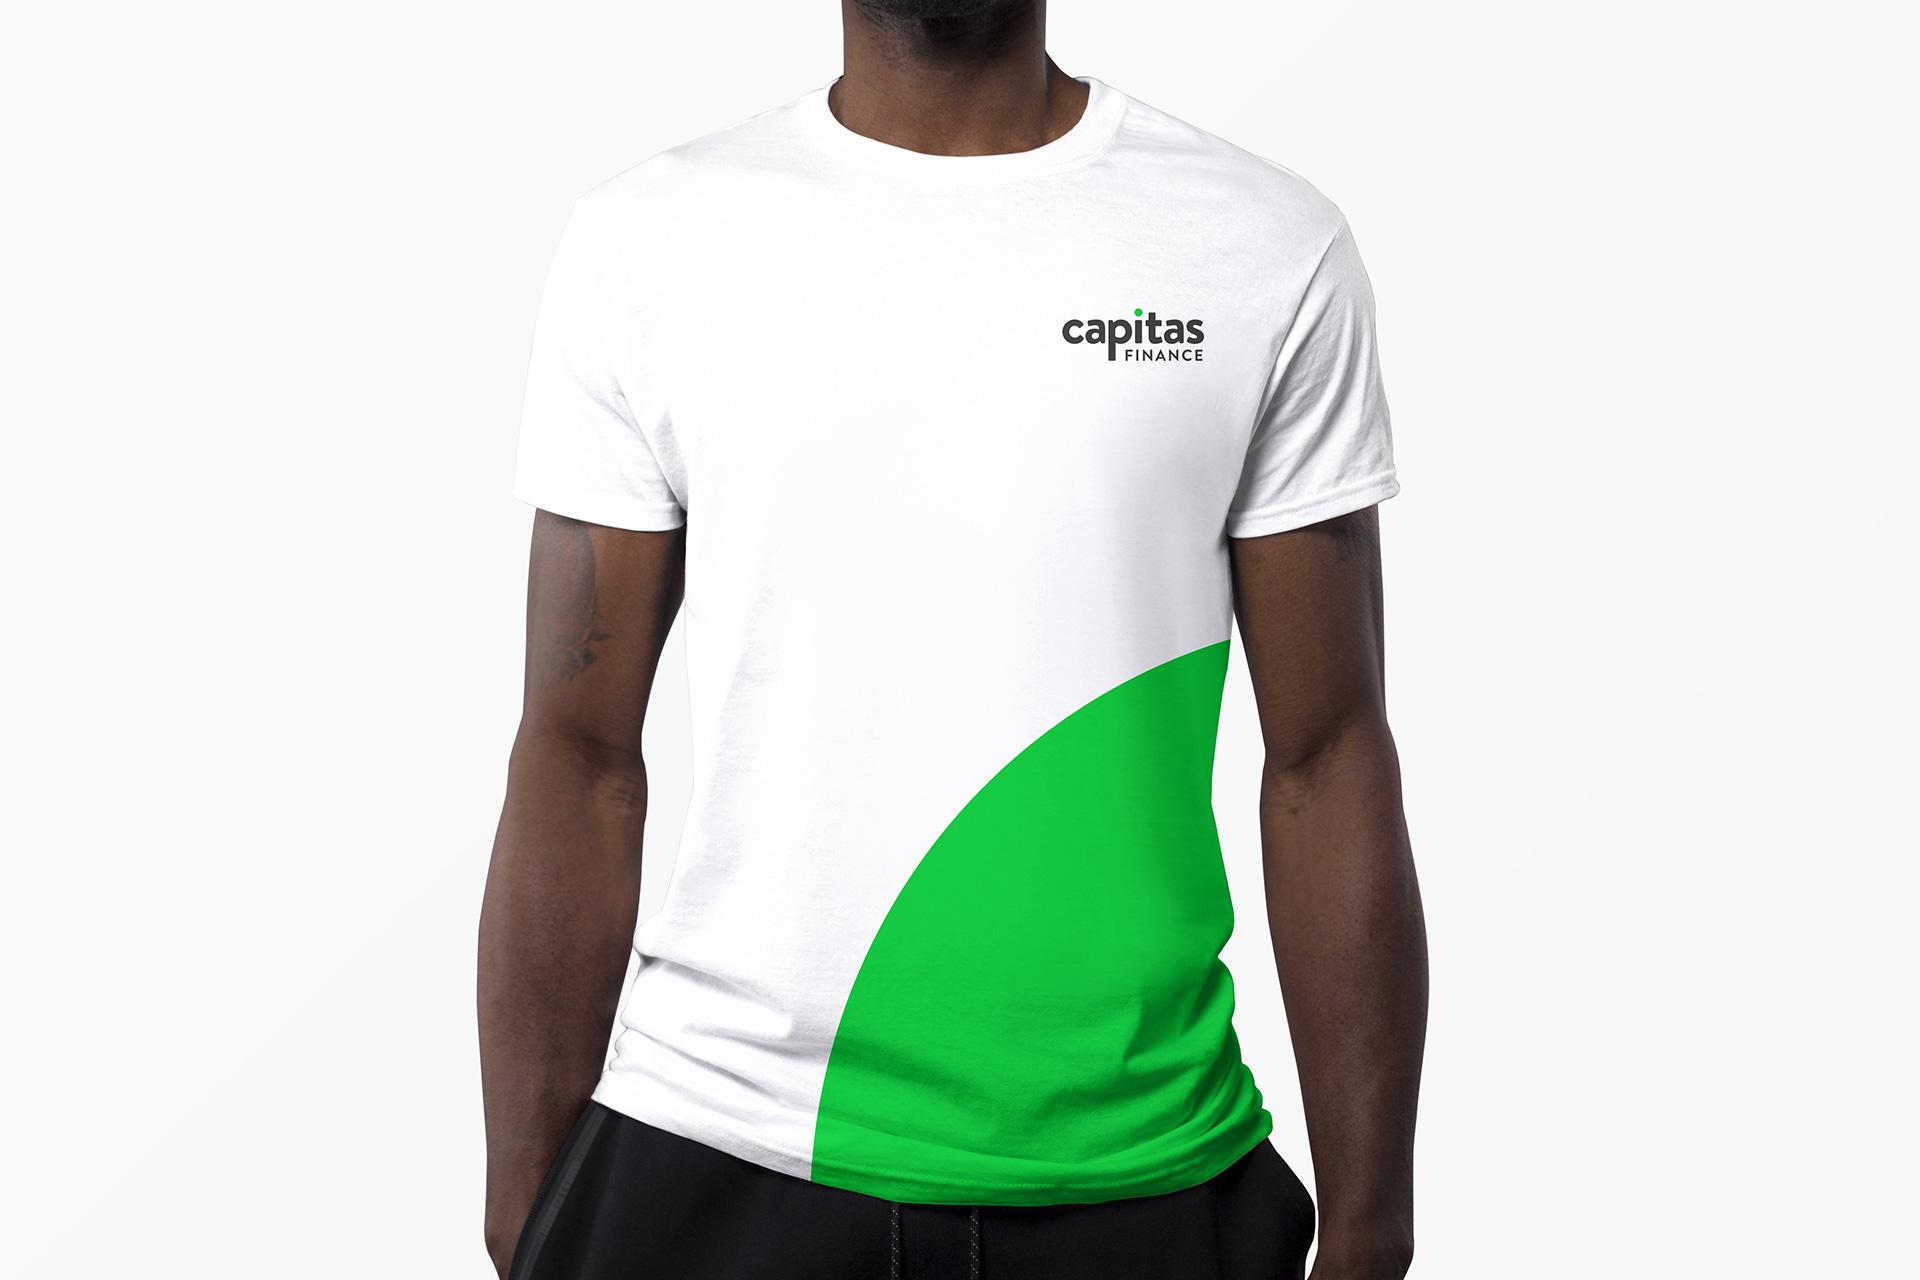 Capitas Finance - Branded T-Shirt Design